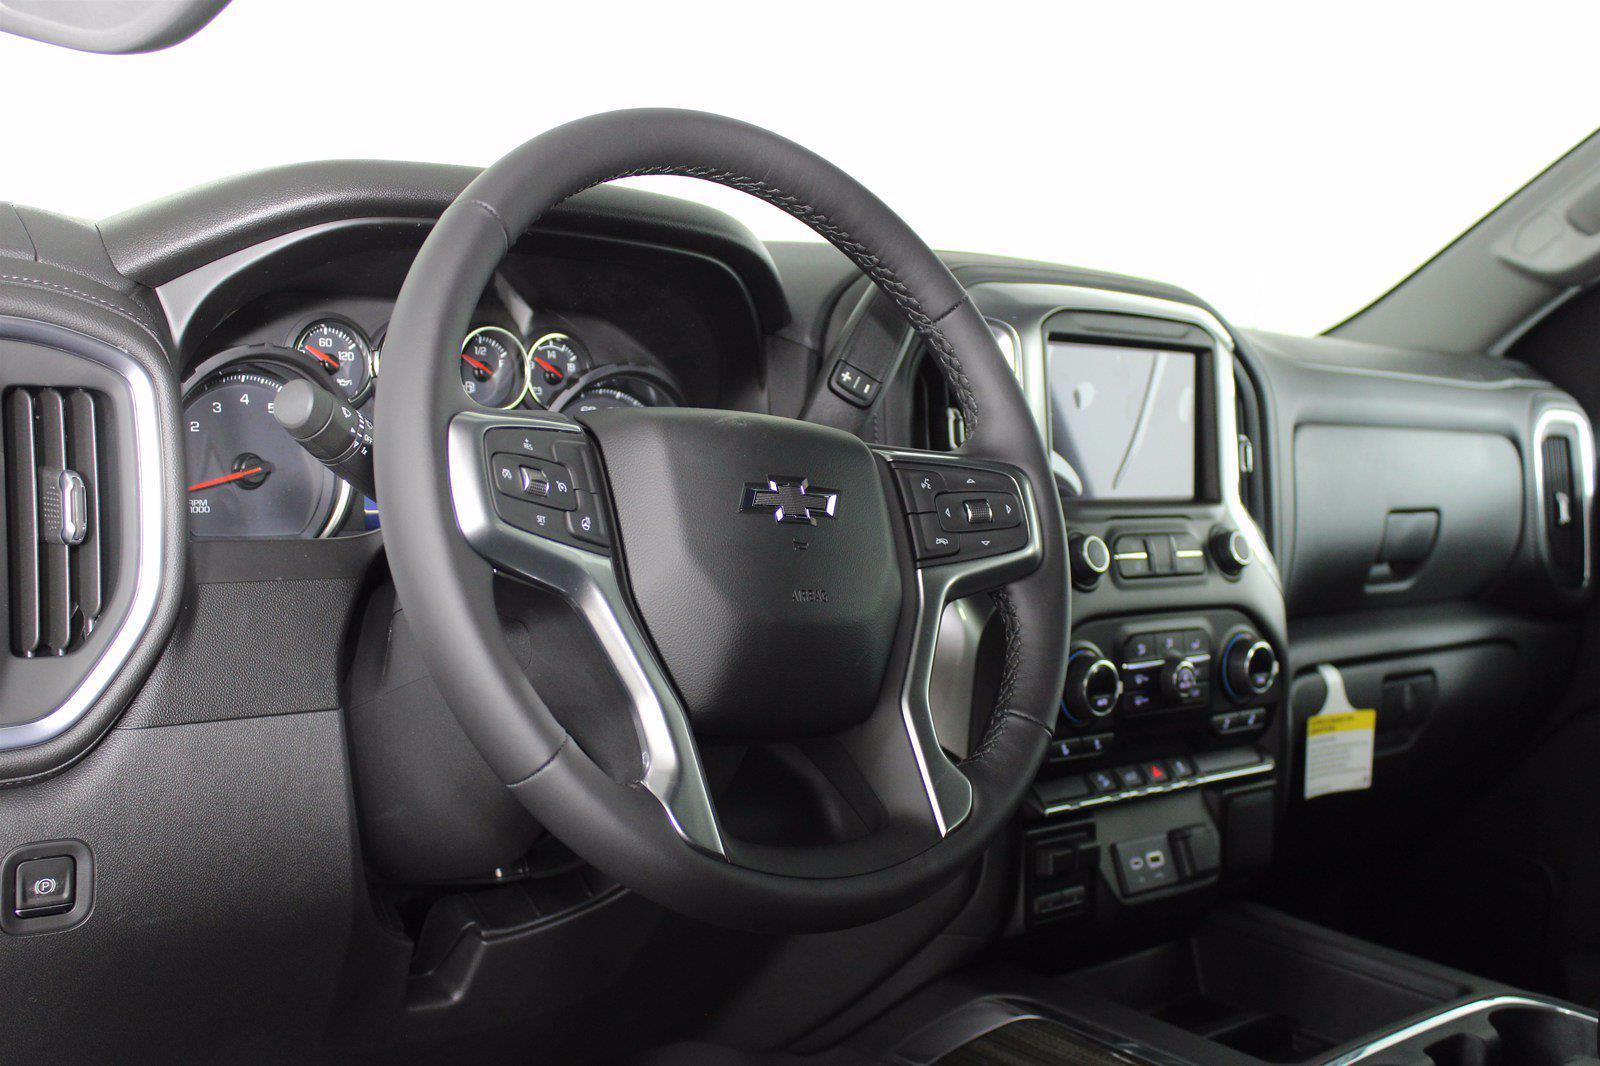 2021 Chevrolet Silverado 1500 Crew Cab 4x4, Pickup #D111109 - photo 10